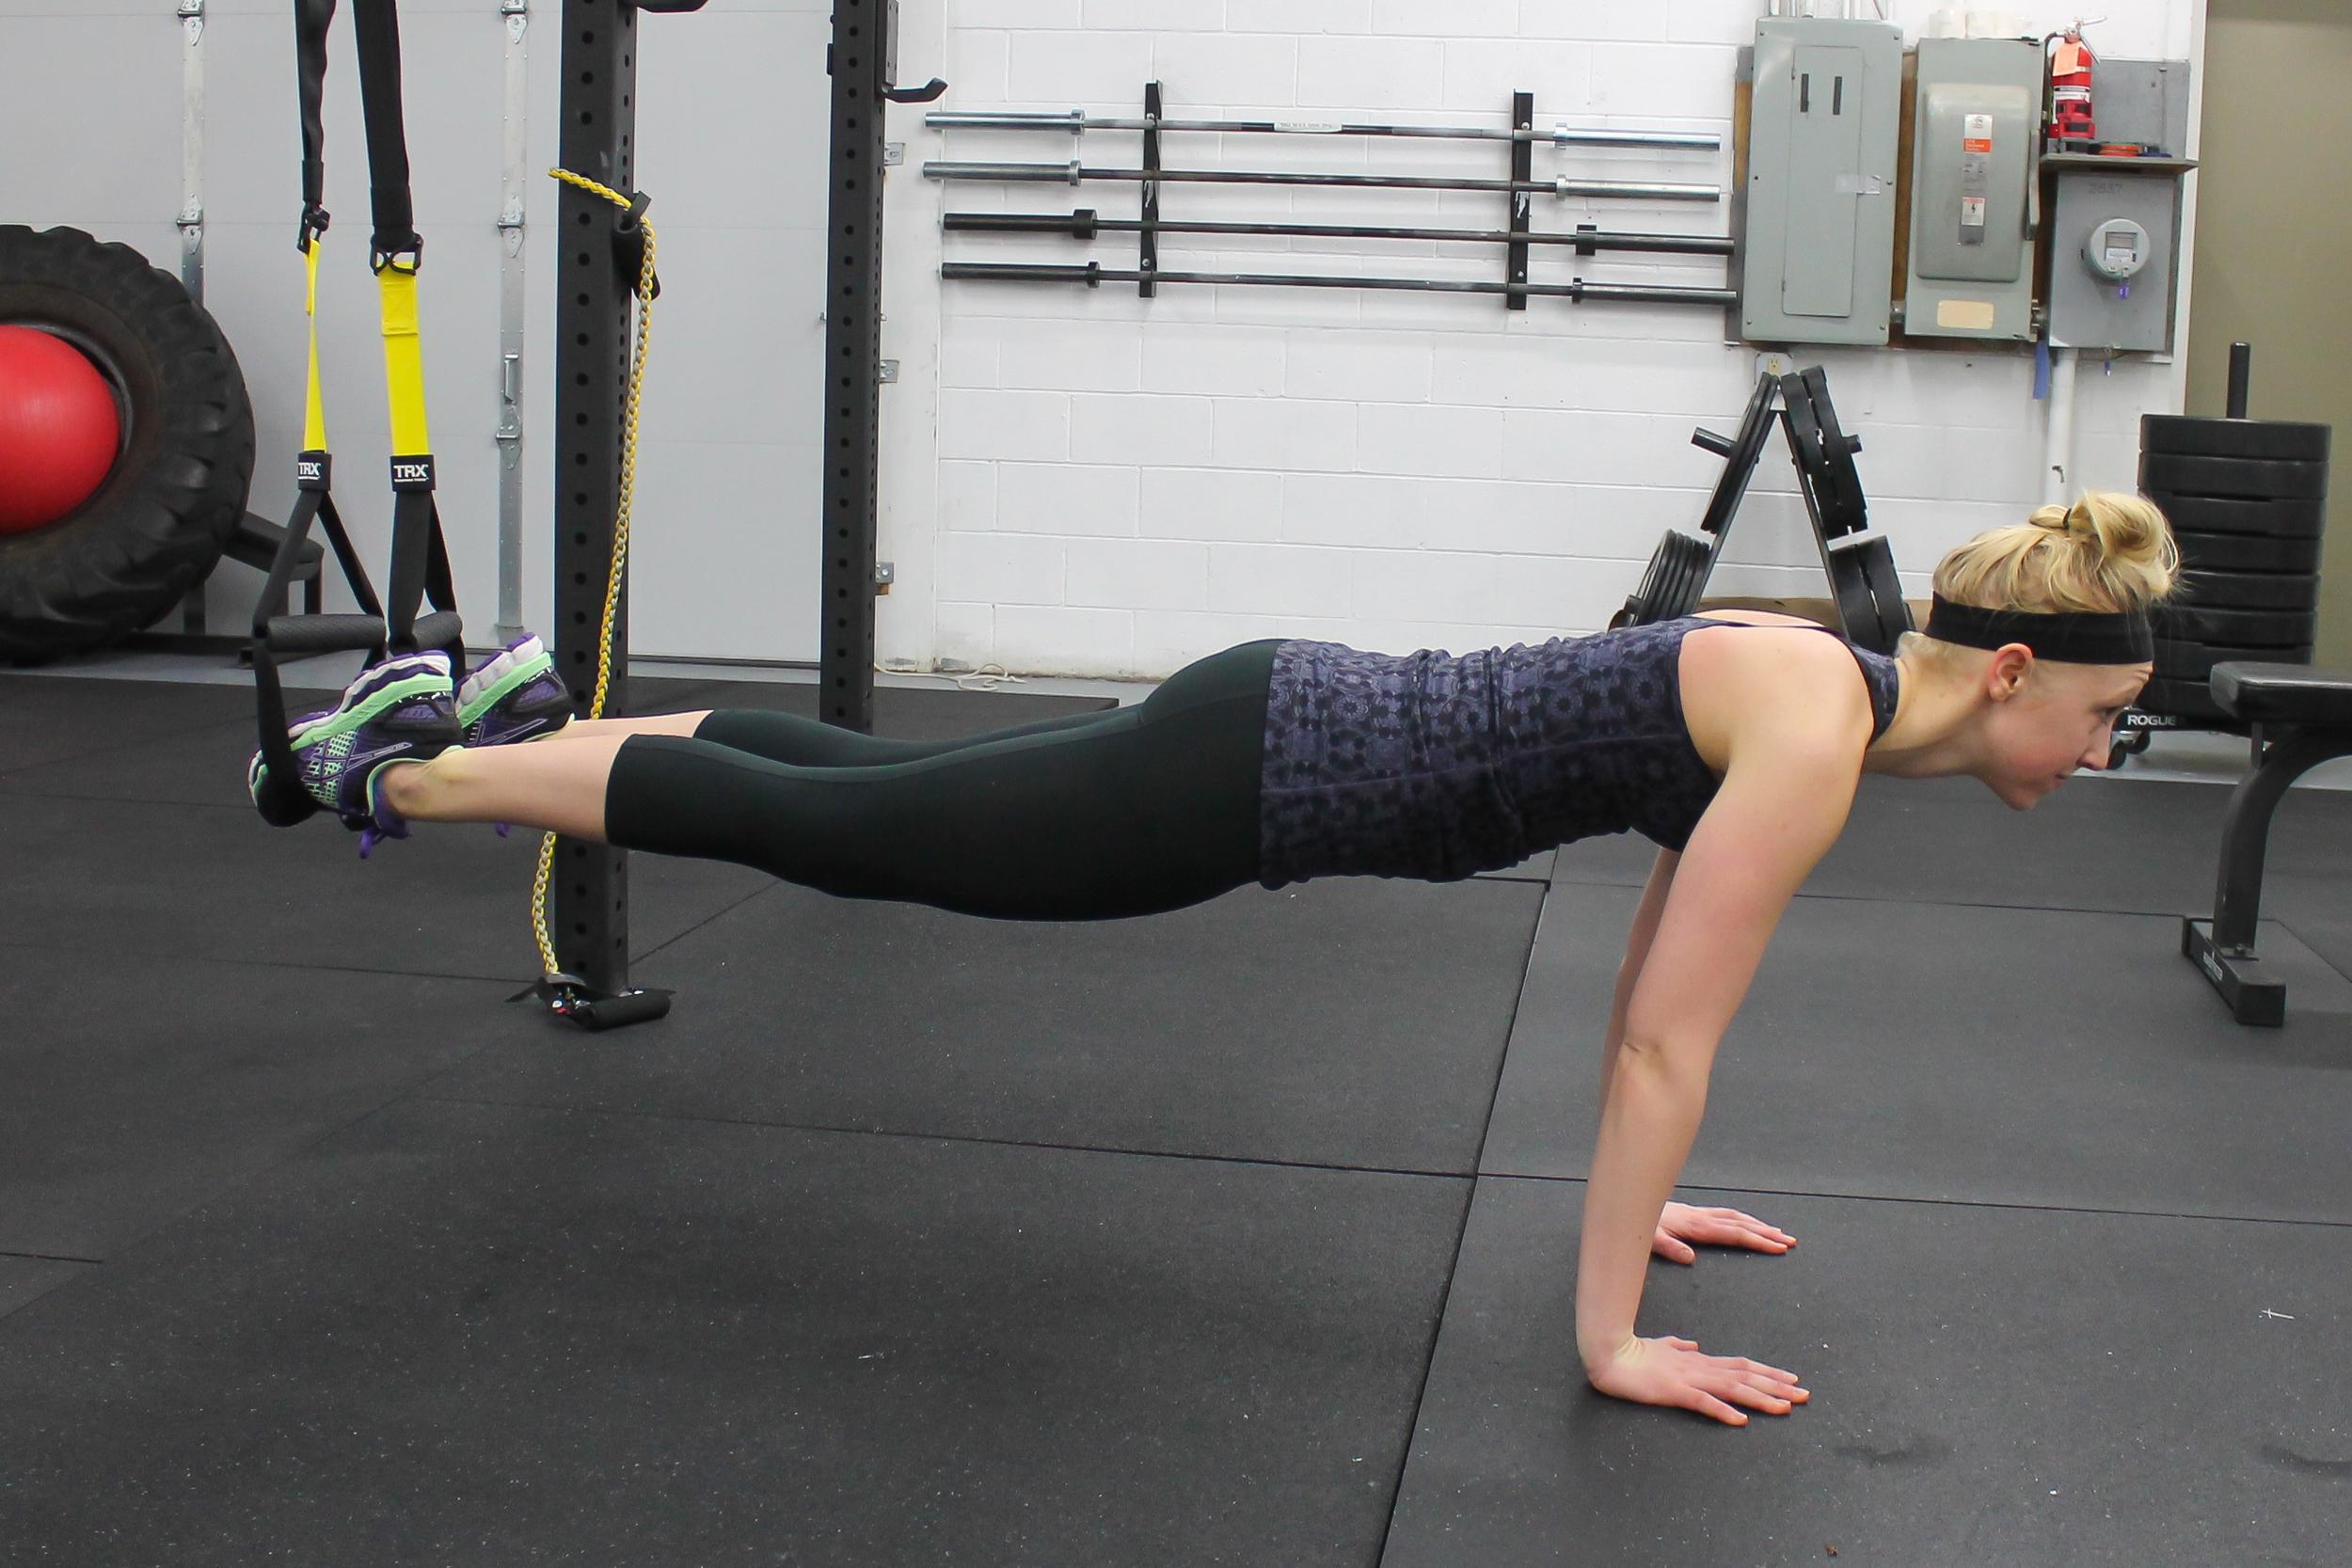 BEAST Gym Minneapolis, Crossfit, HIIT, TRX, Kettlebells, Minnetonka, Review, Fitness Review